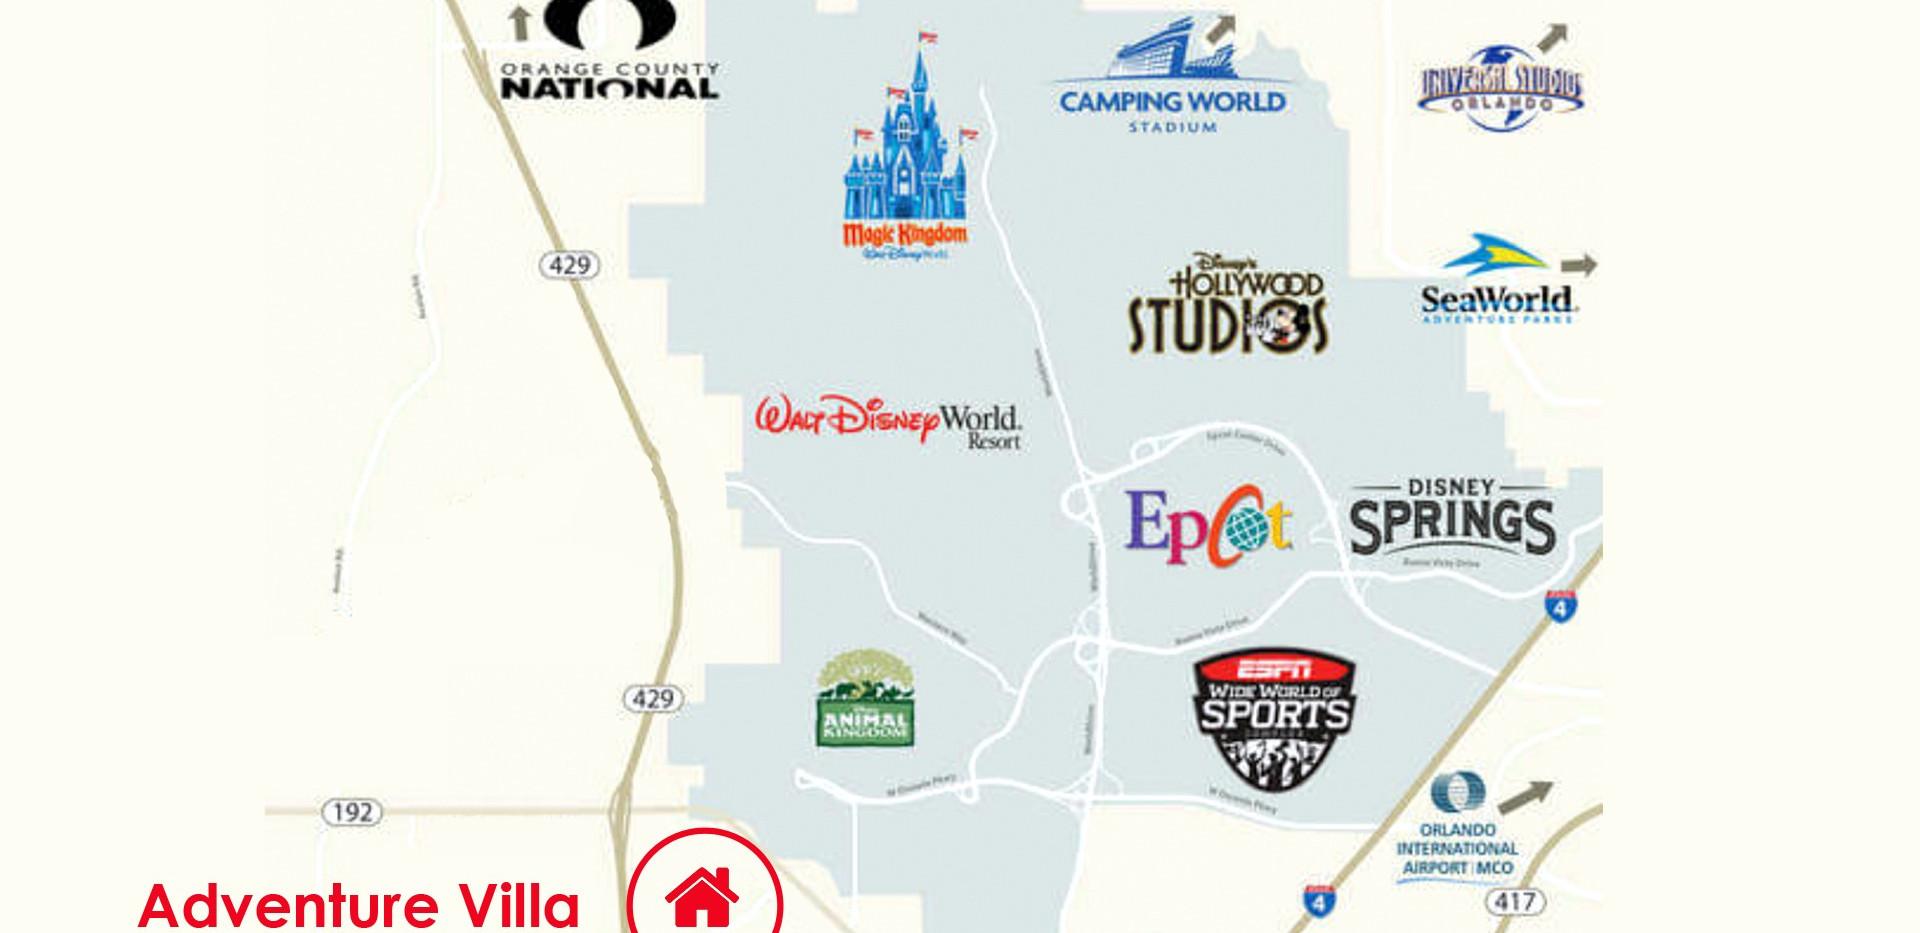 eddy map.jpg